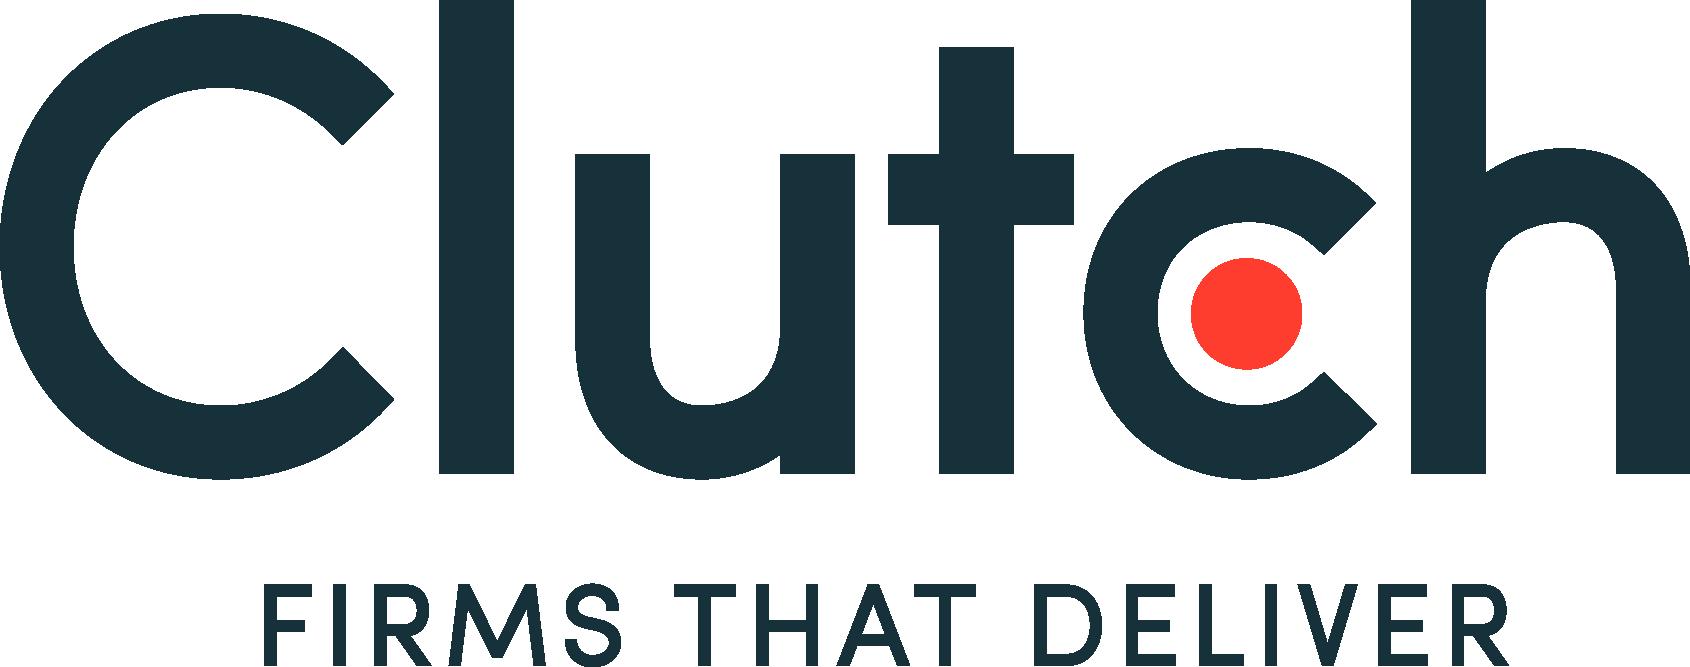 clutch seo company london reviews